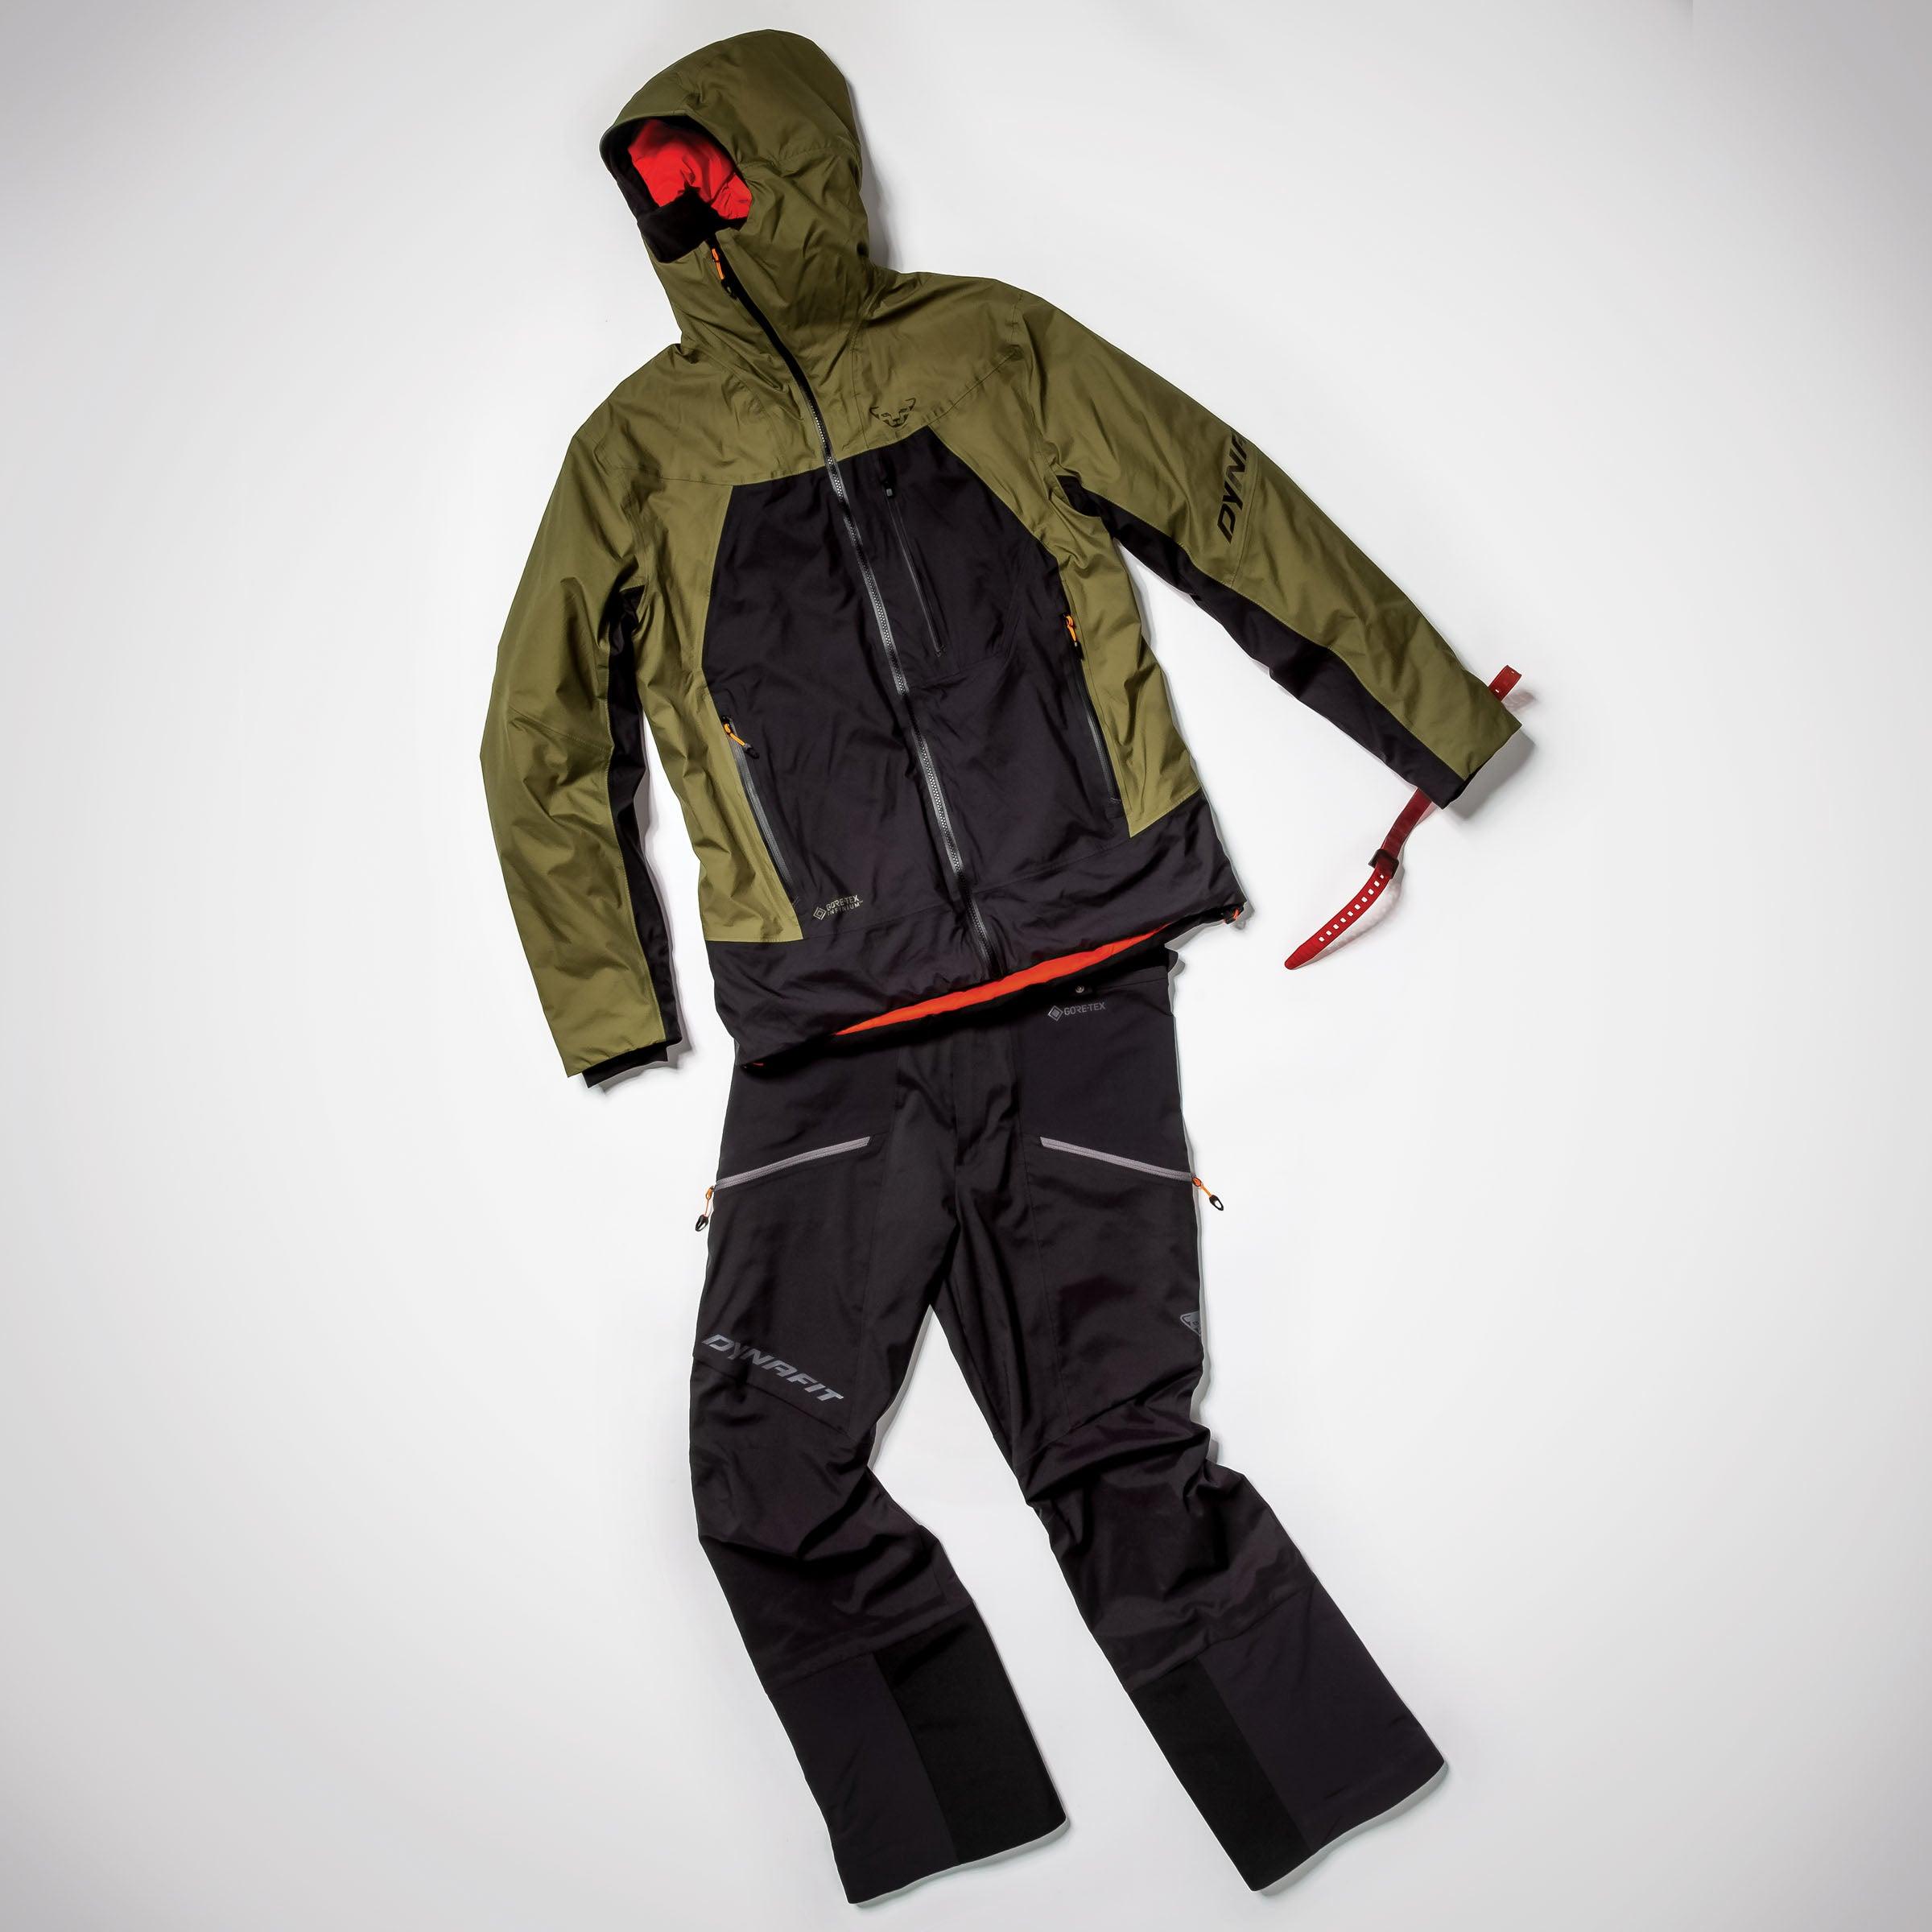 Dynafit Free Infinium Insulation Jacket and Free Infinium Hybrid Pants